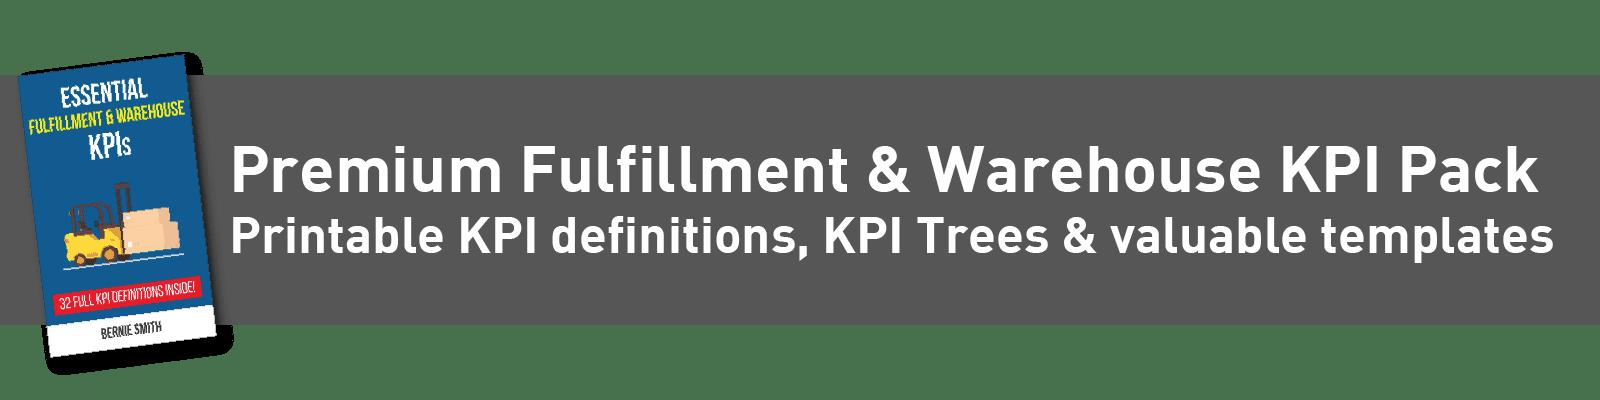 Fulfillment and Warehouse Masthead - B